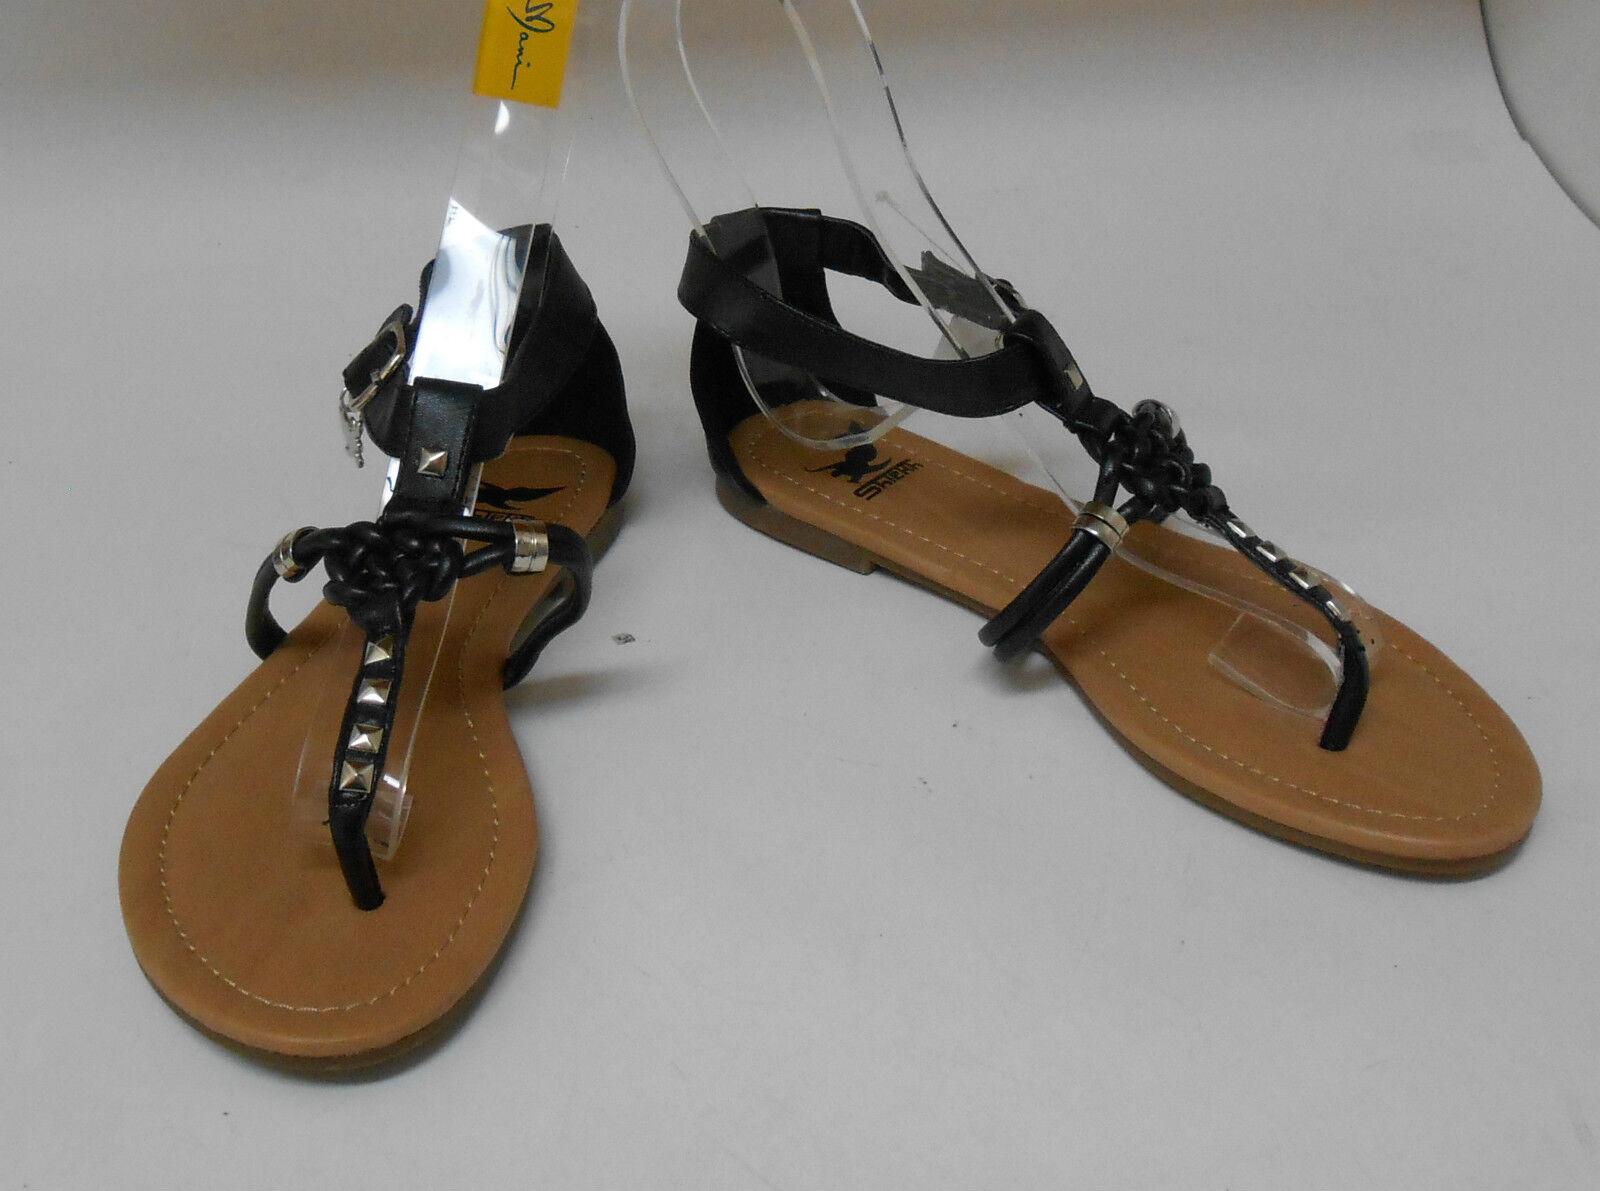 Summer Black Womens Shoes Roman 6 Gladiator Flat Sandals Size 6 Roman bf38b6